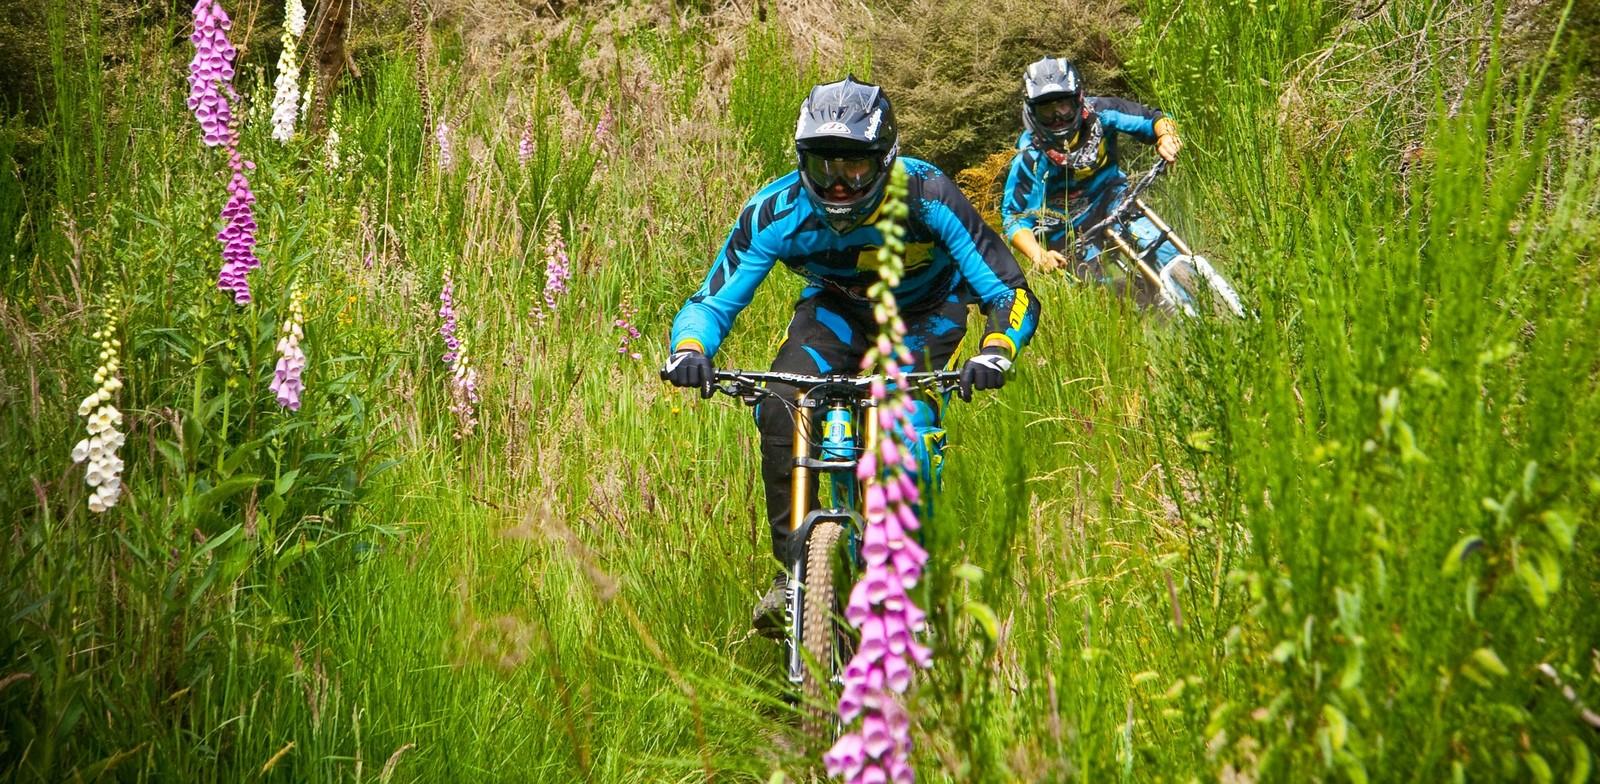 Dylan and Raphael - Banditdh - Mountain Biking Pictures - Vital MTB